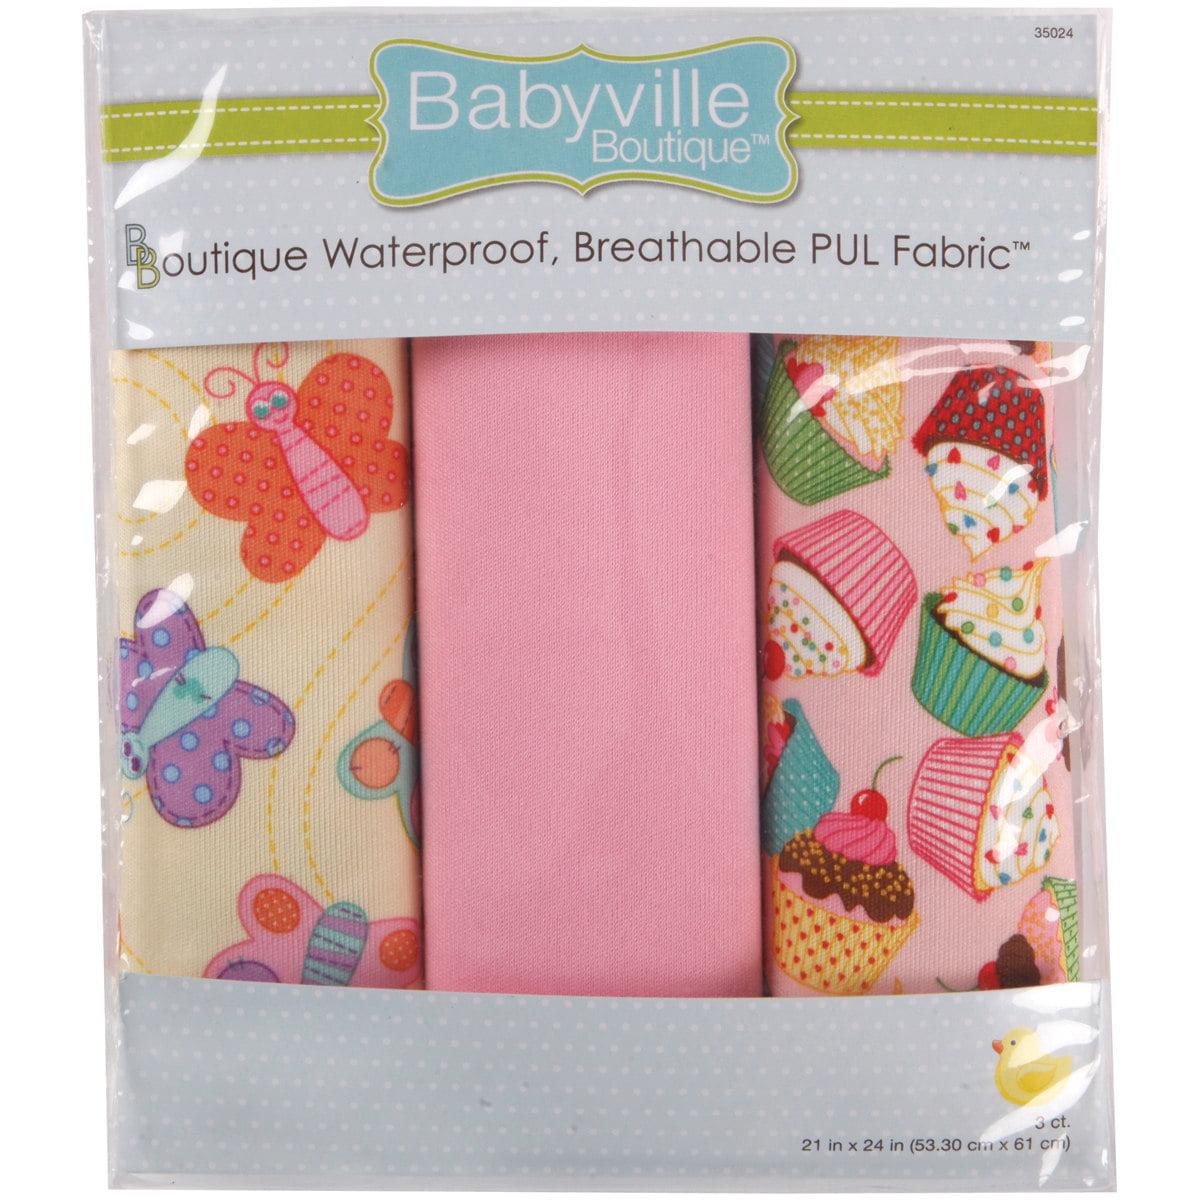 Dritz Babyville PUL Waterproof Diaper Fabric 21 x 24 Cuts 3//Pkg-Black Chevron /& Pink Floral